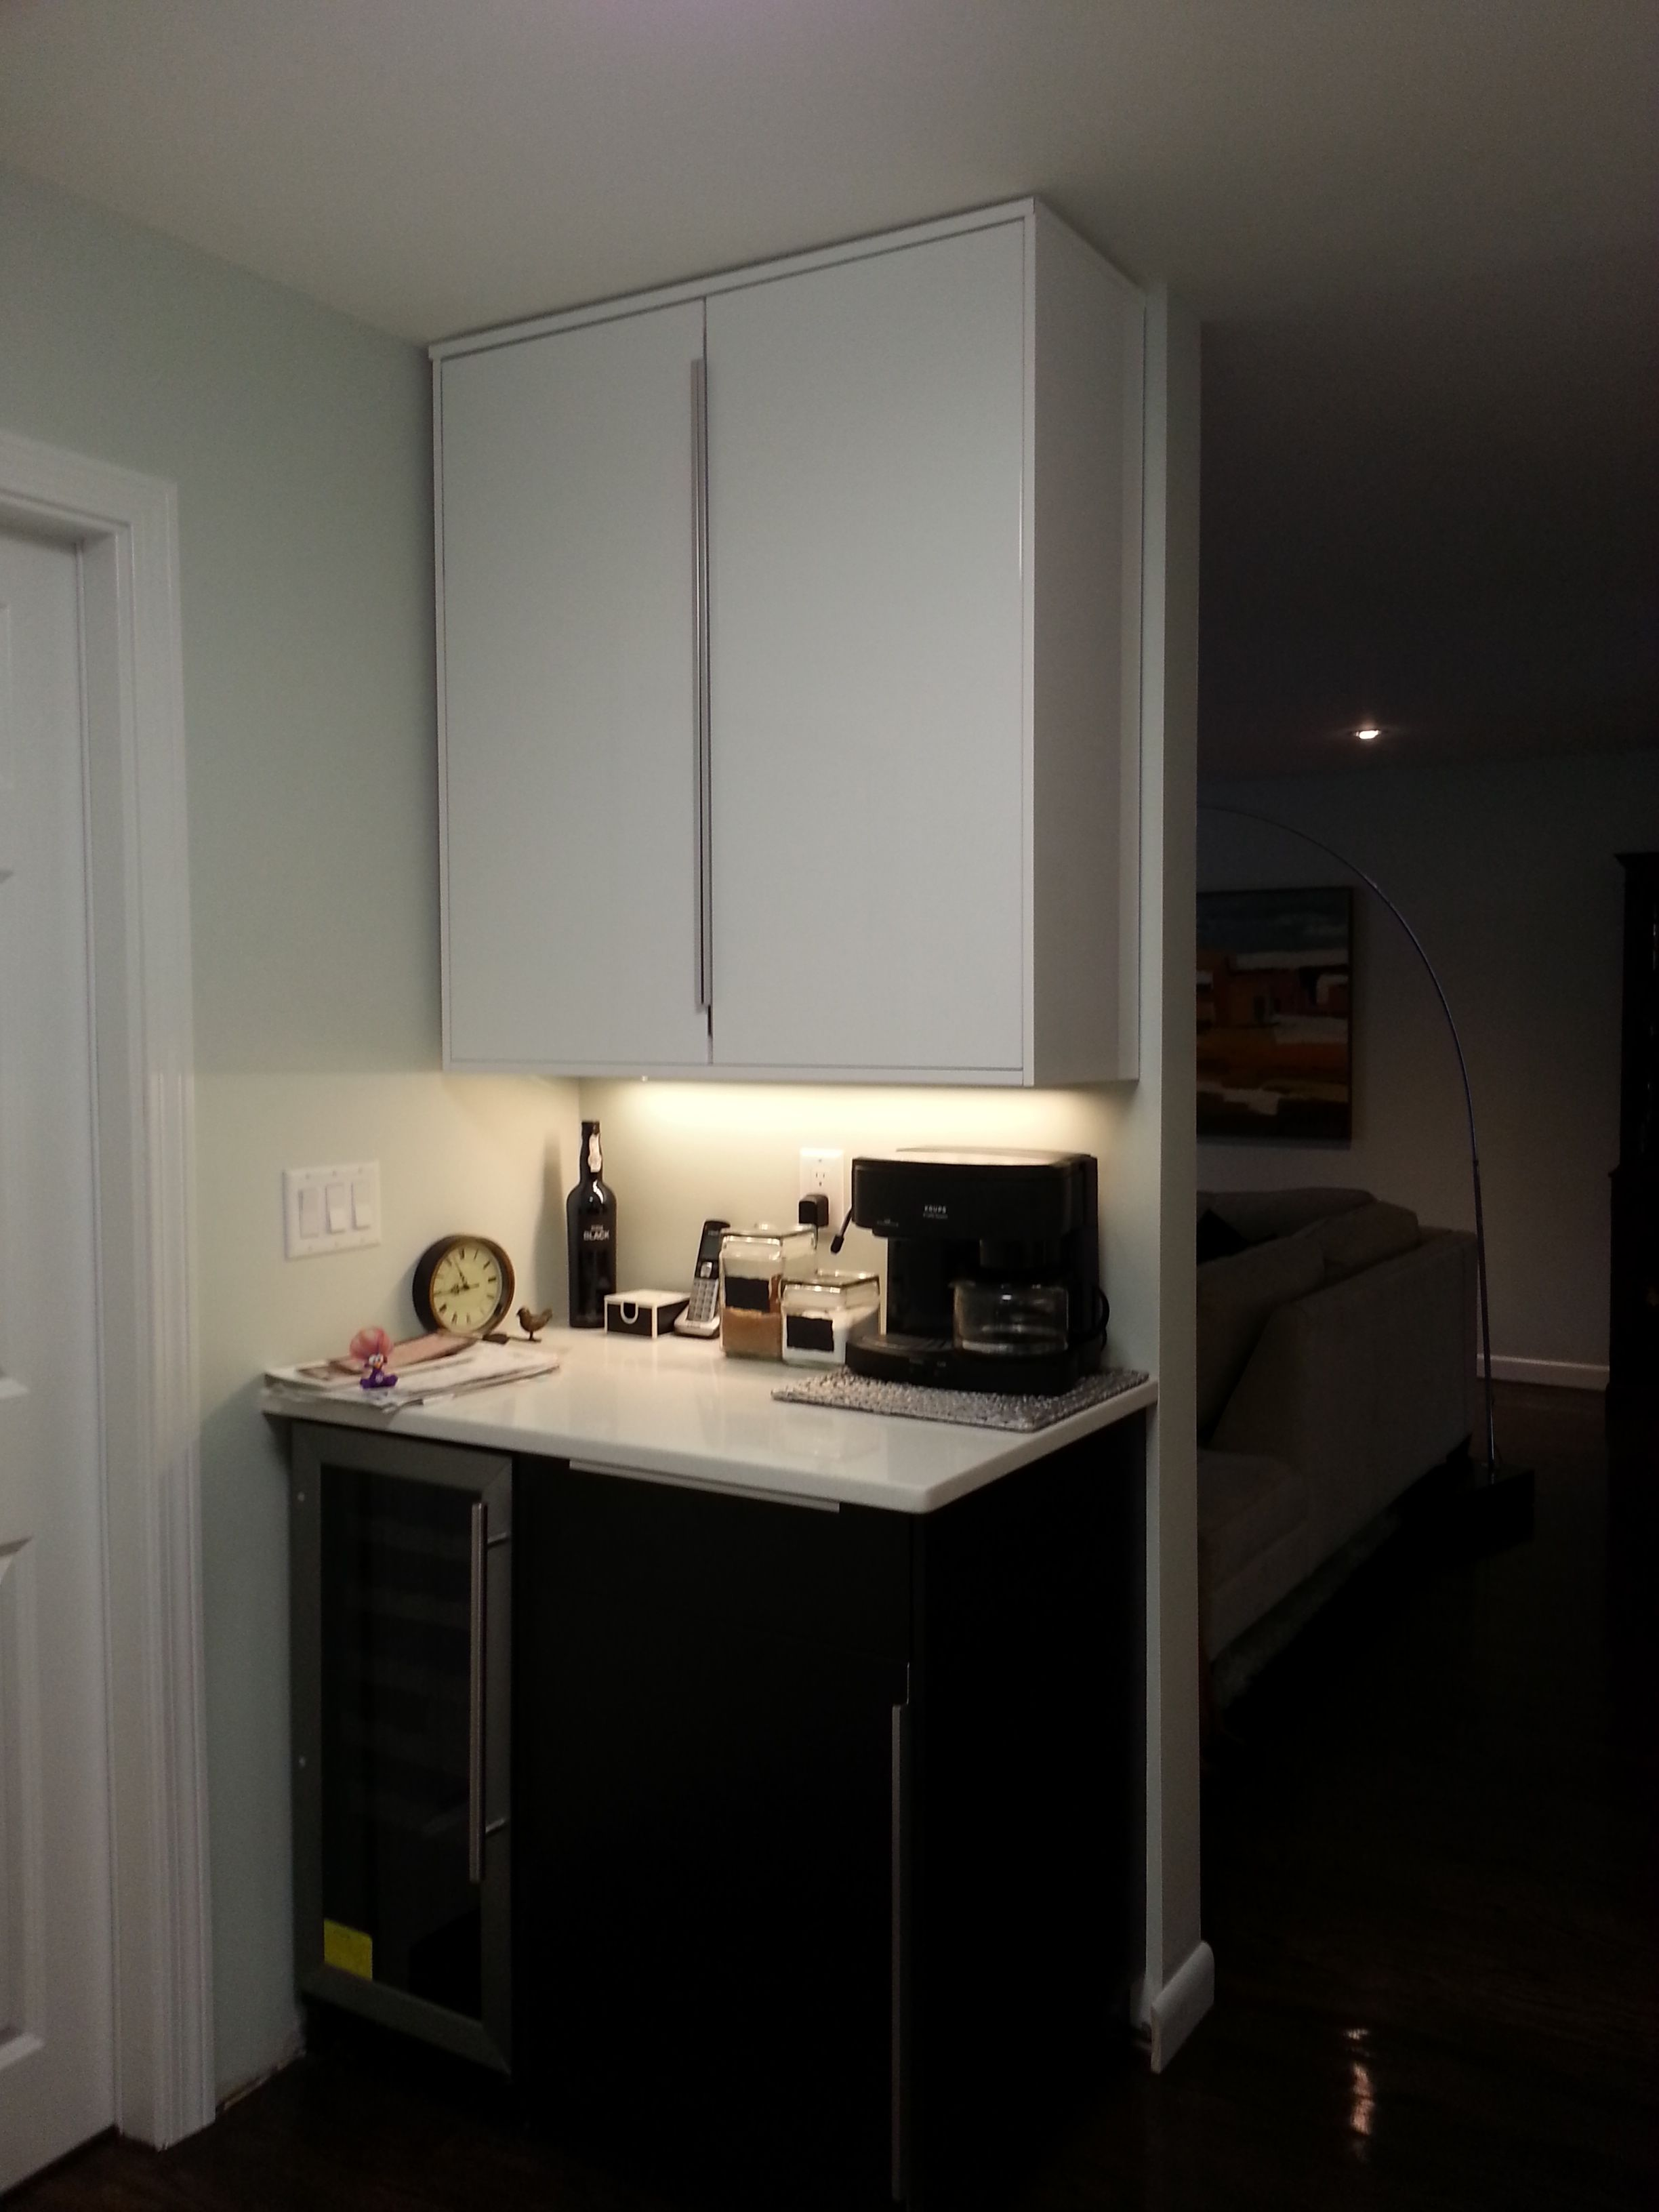 90298298d61a3bea864aa3802b8e66f0 Frais De Bar Ikea Cuisine Concept